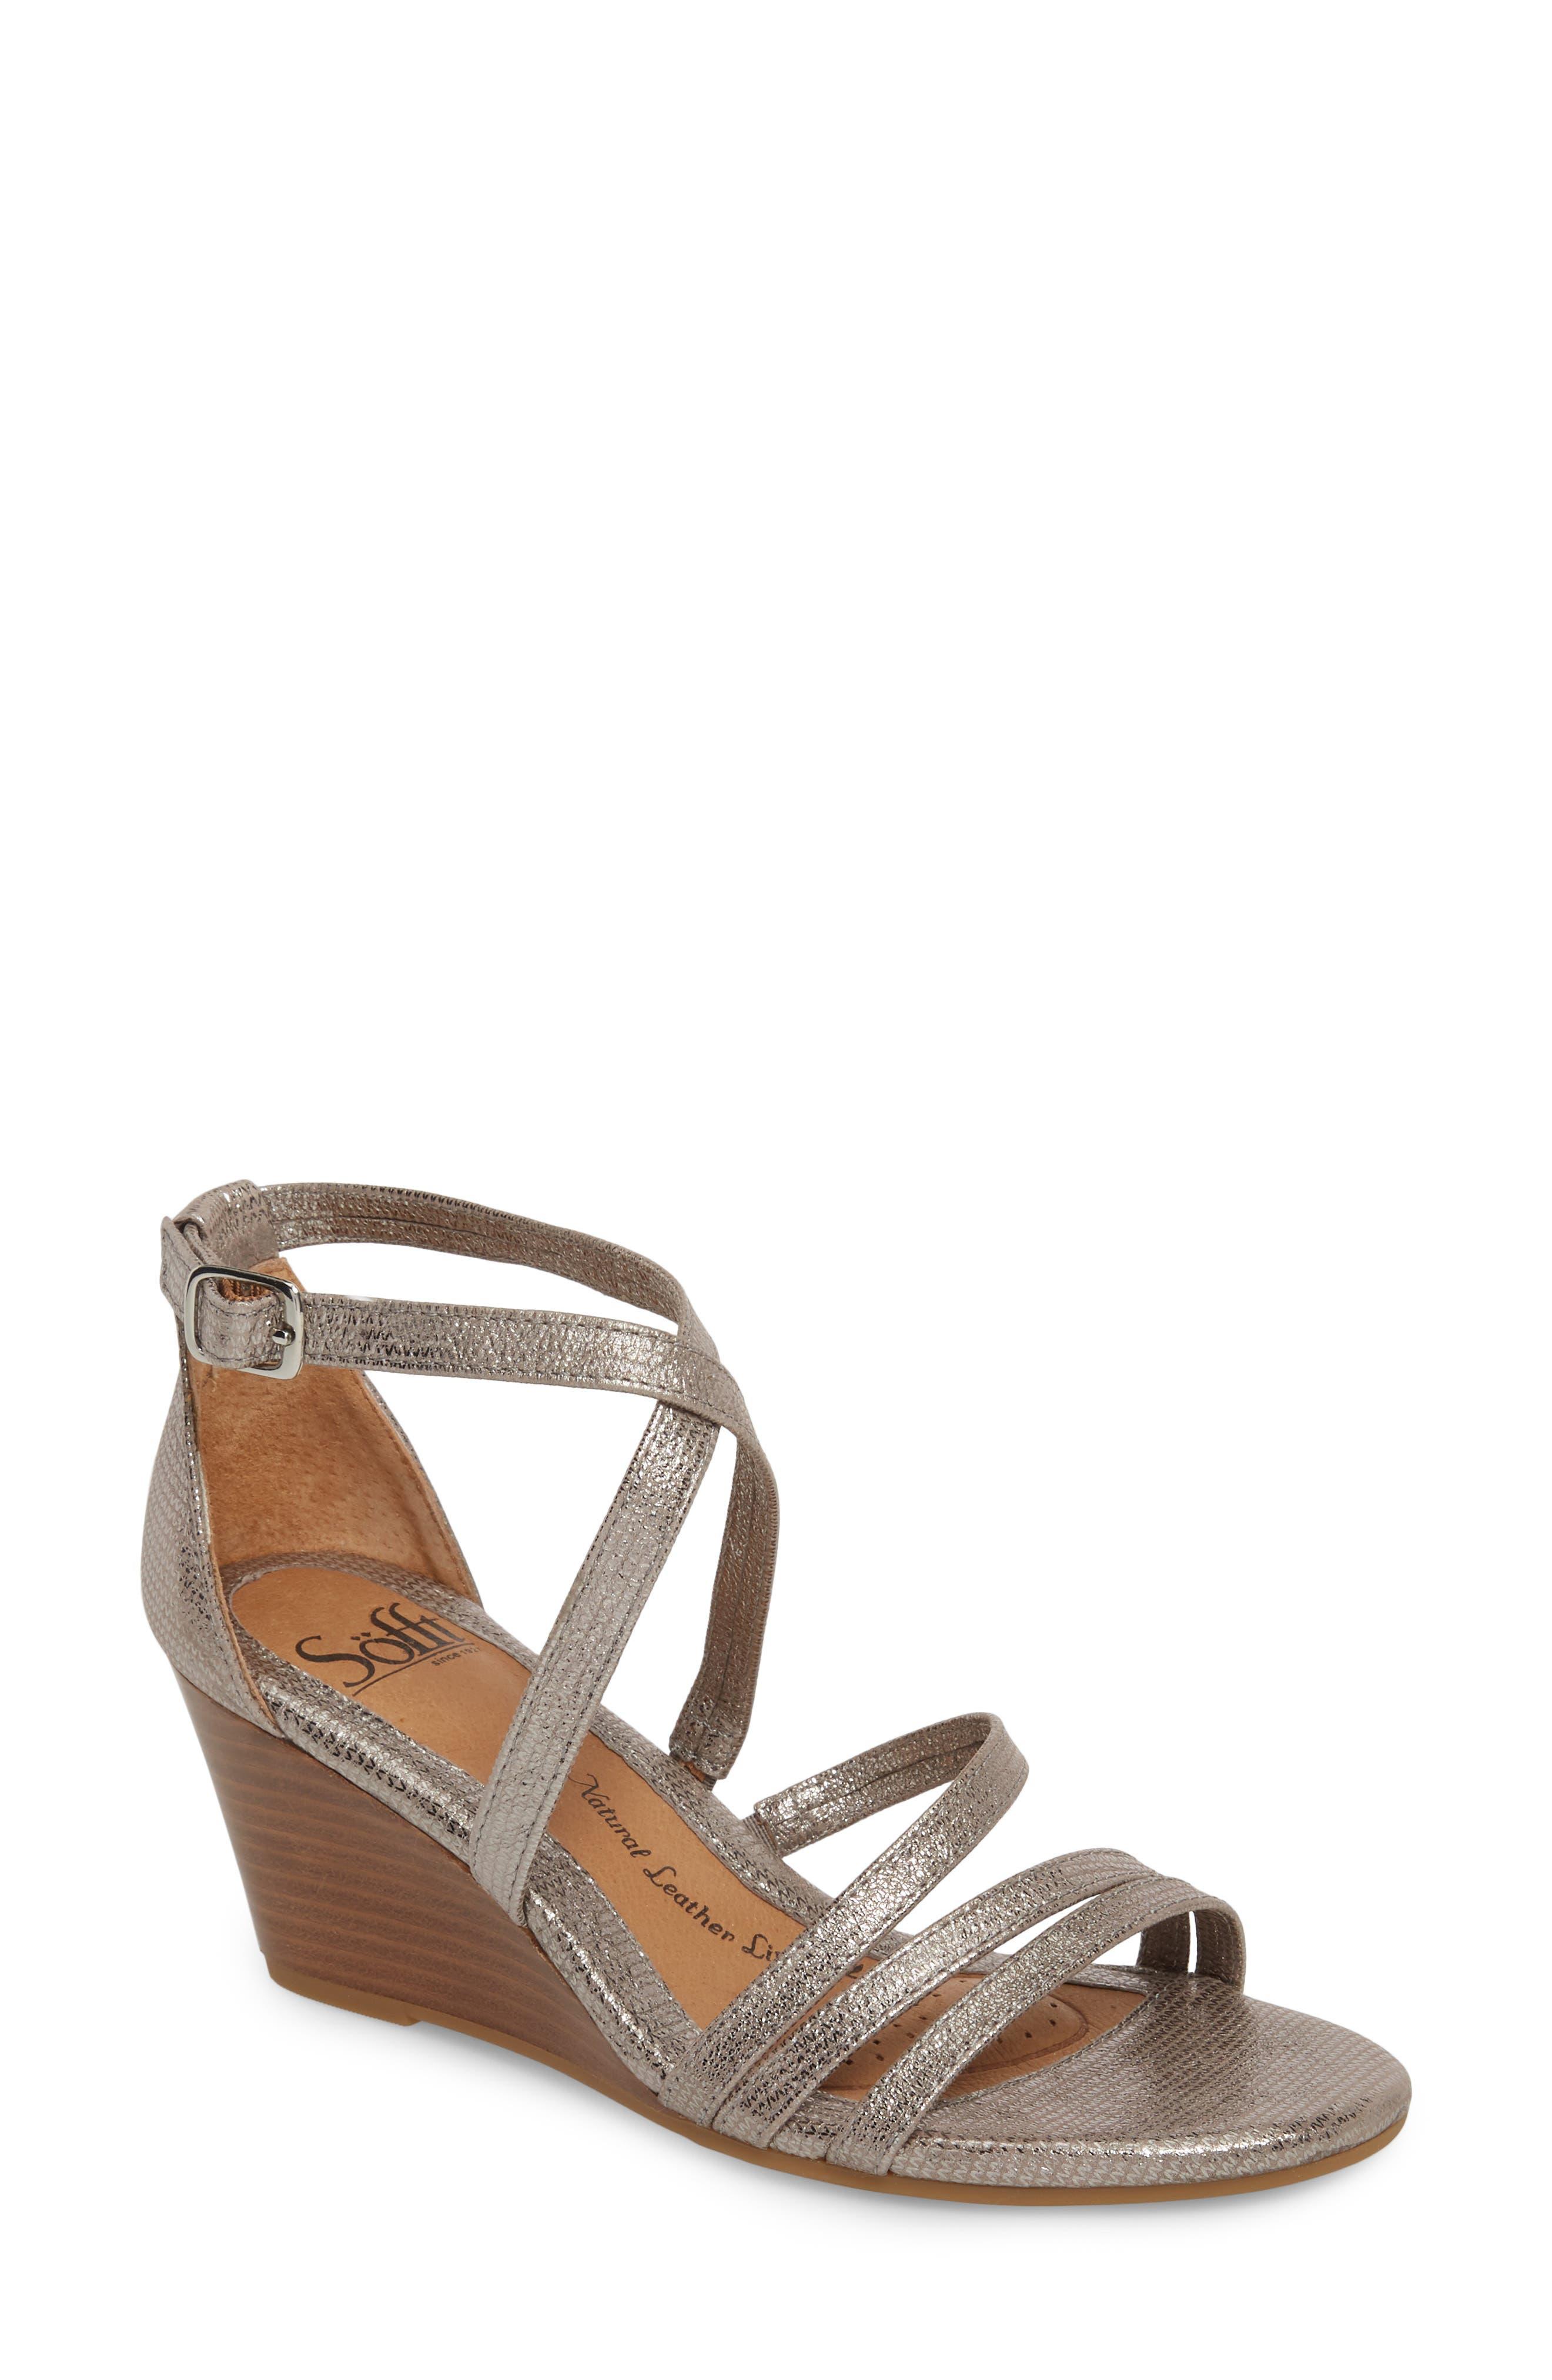 Mecina Wedge Sandal,                         Main,                         color, Silver Metallic Leather